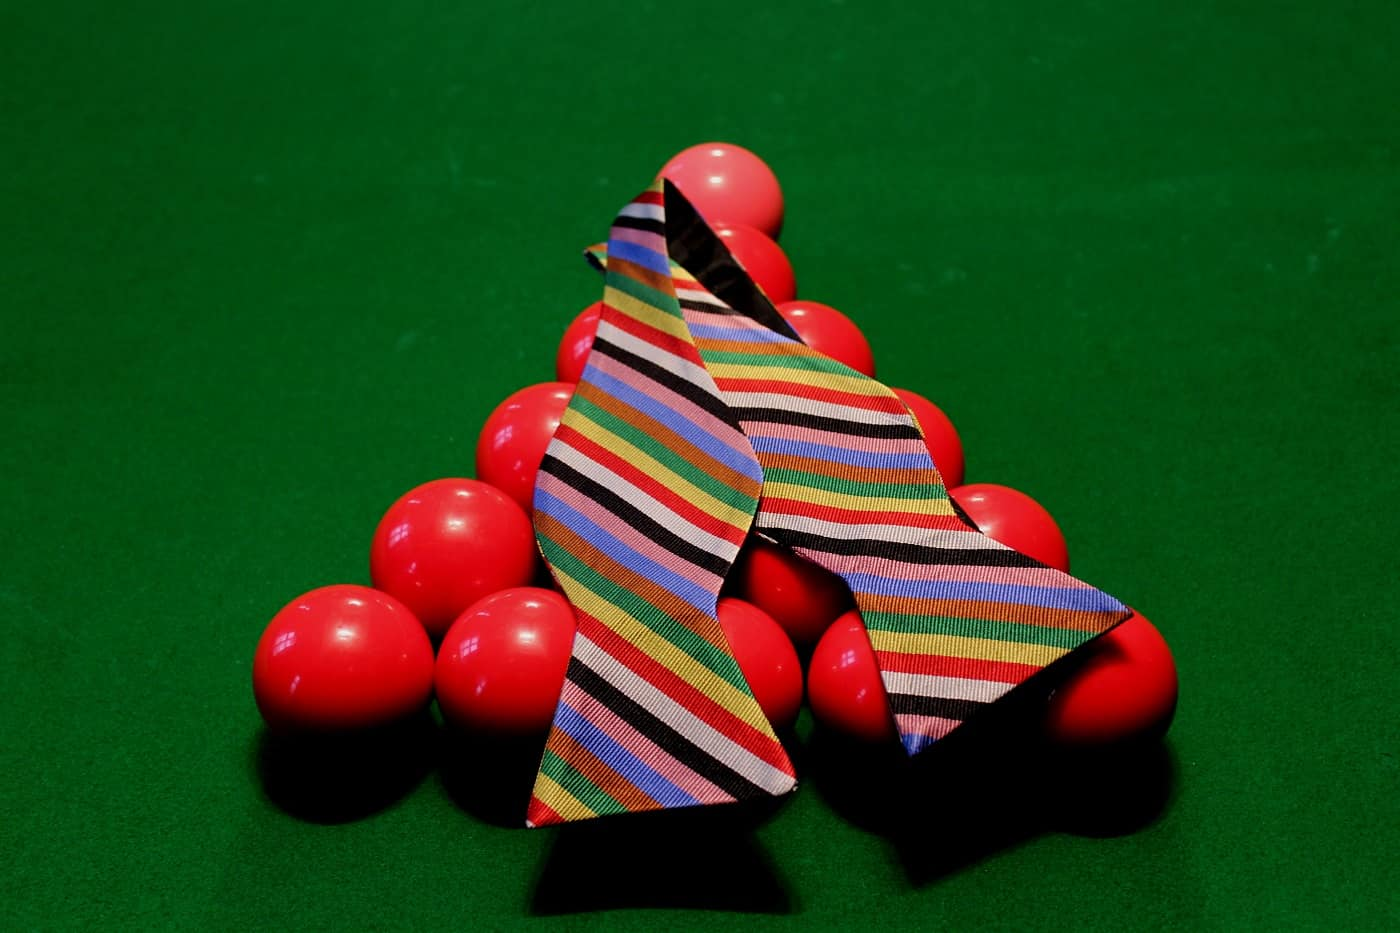 Bow Tie - £26.00